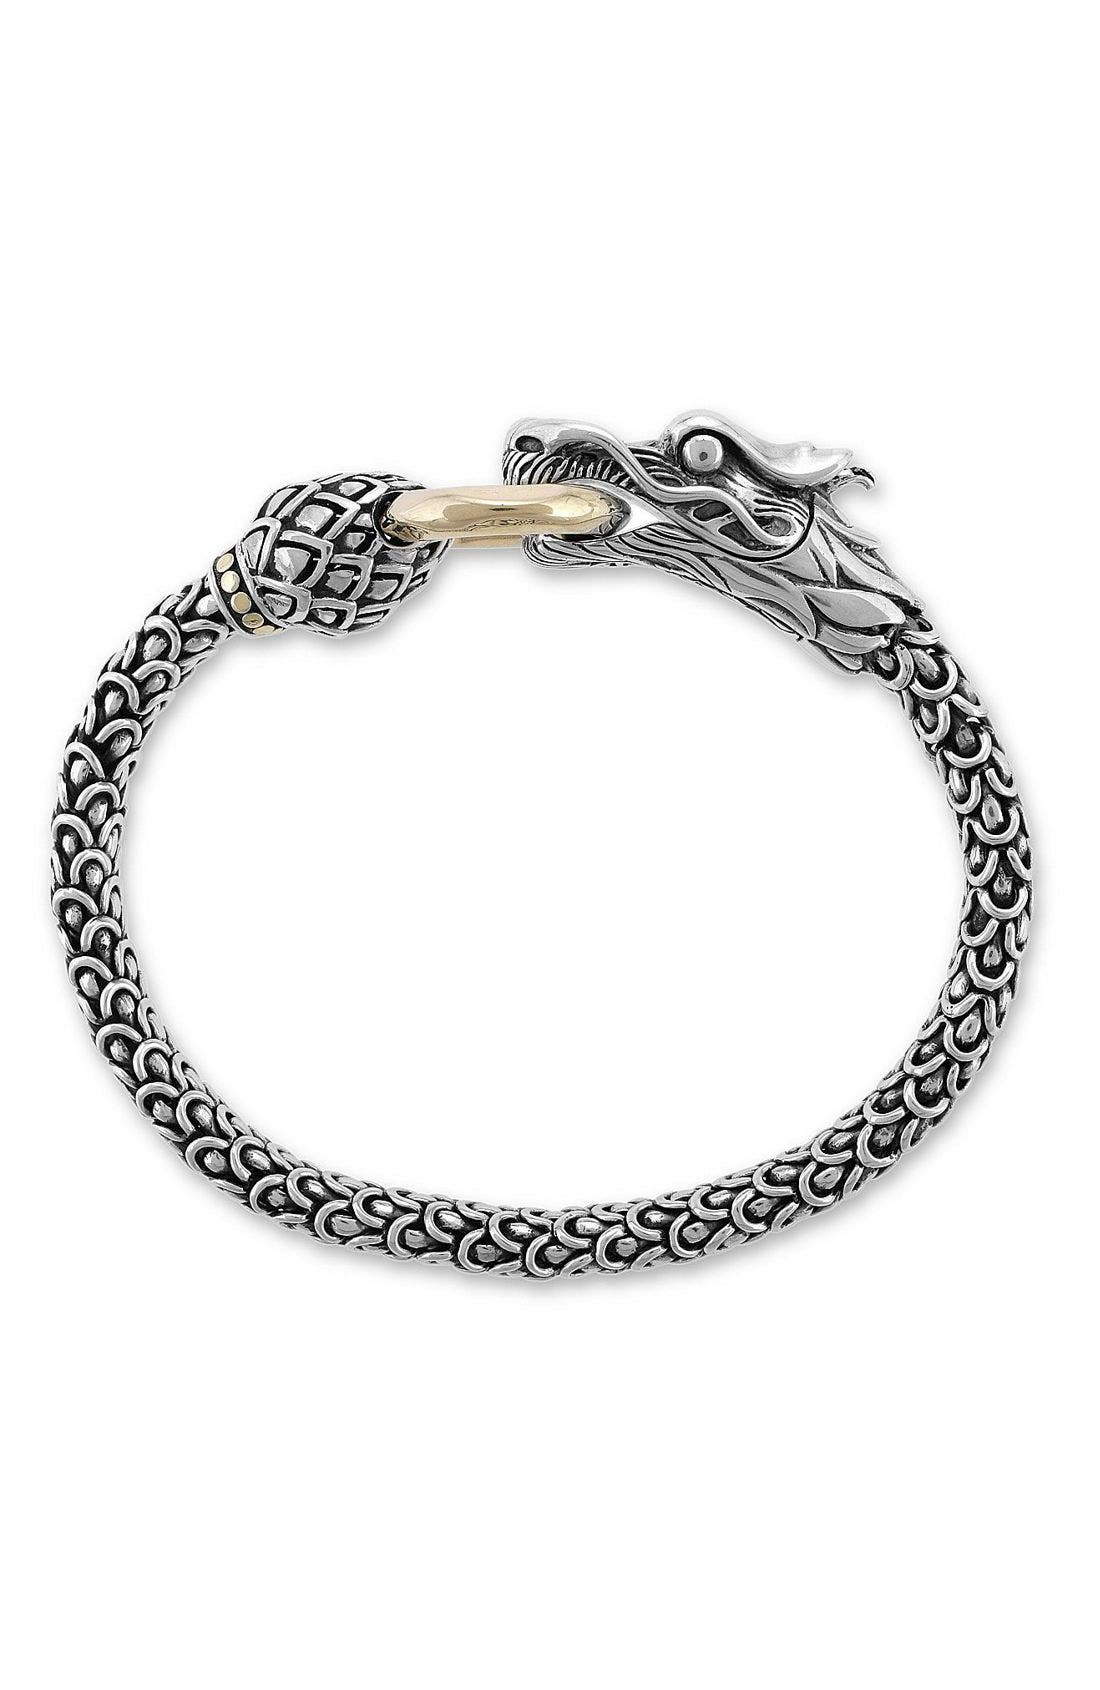 Alternate Image 1 Selected - John Hardy 'Naga' Dragon Bracelet